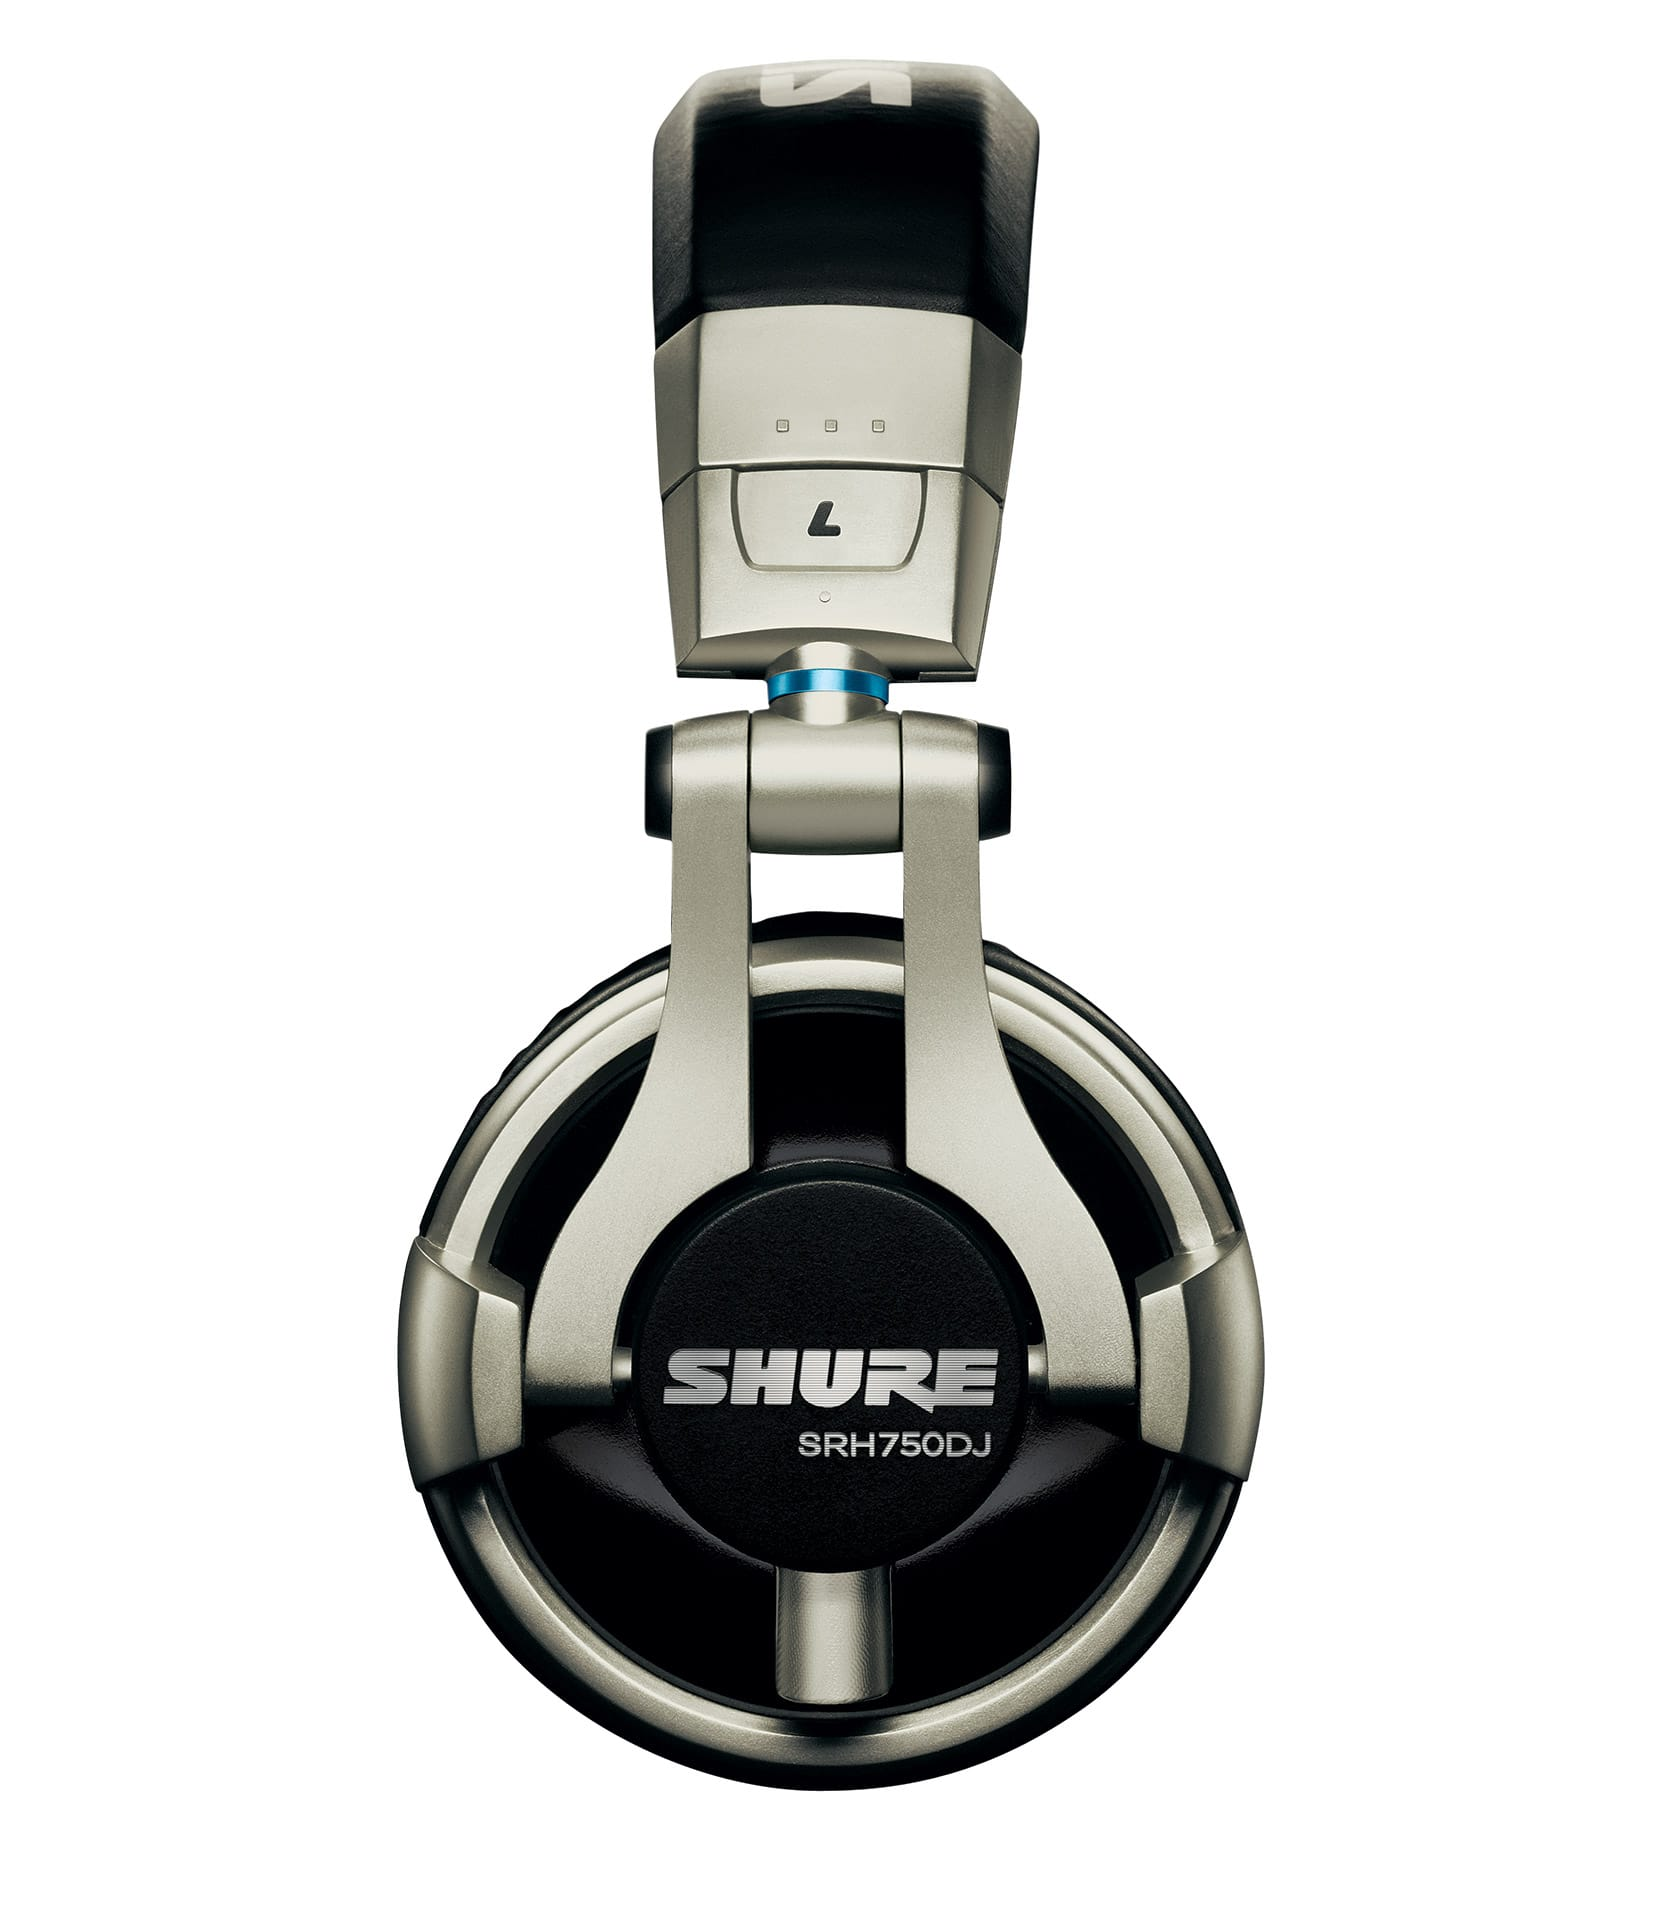 Shure - SRH750DJ EProfessional DJ Headphones - Melody House